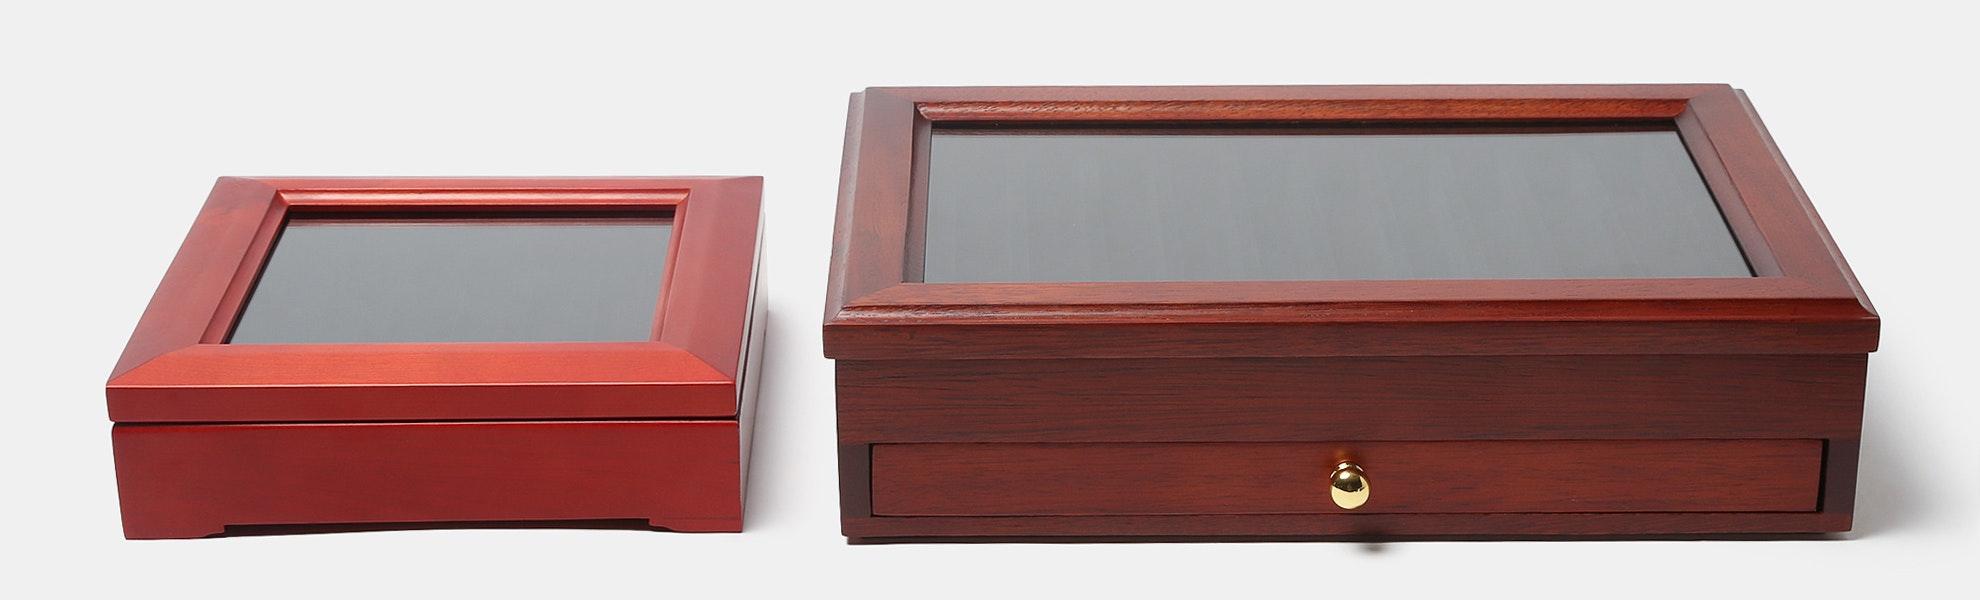 Lanier Wood Display Case